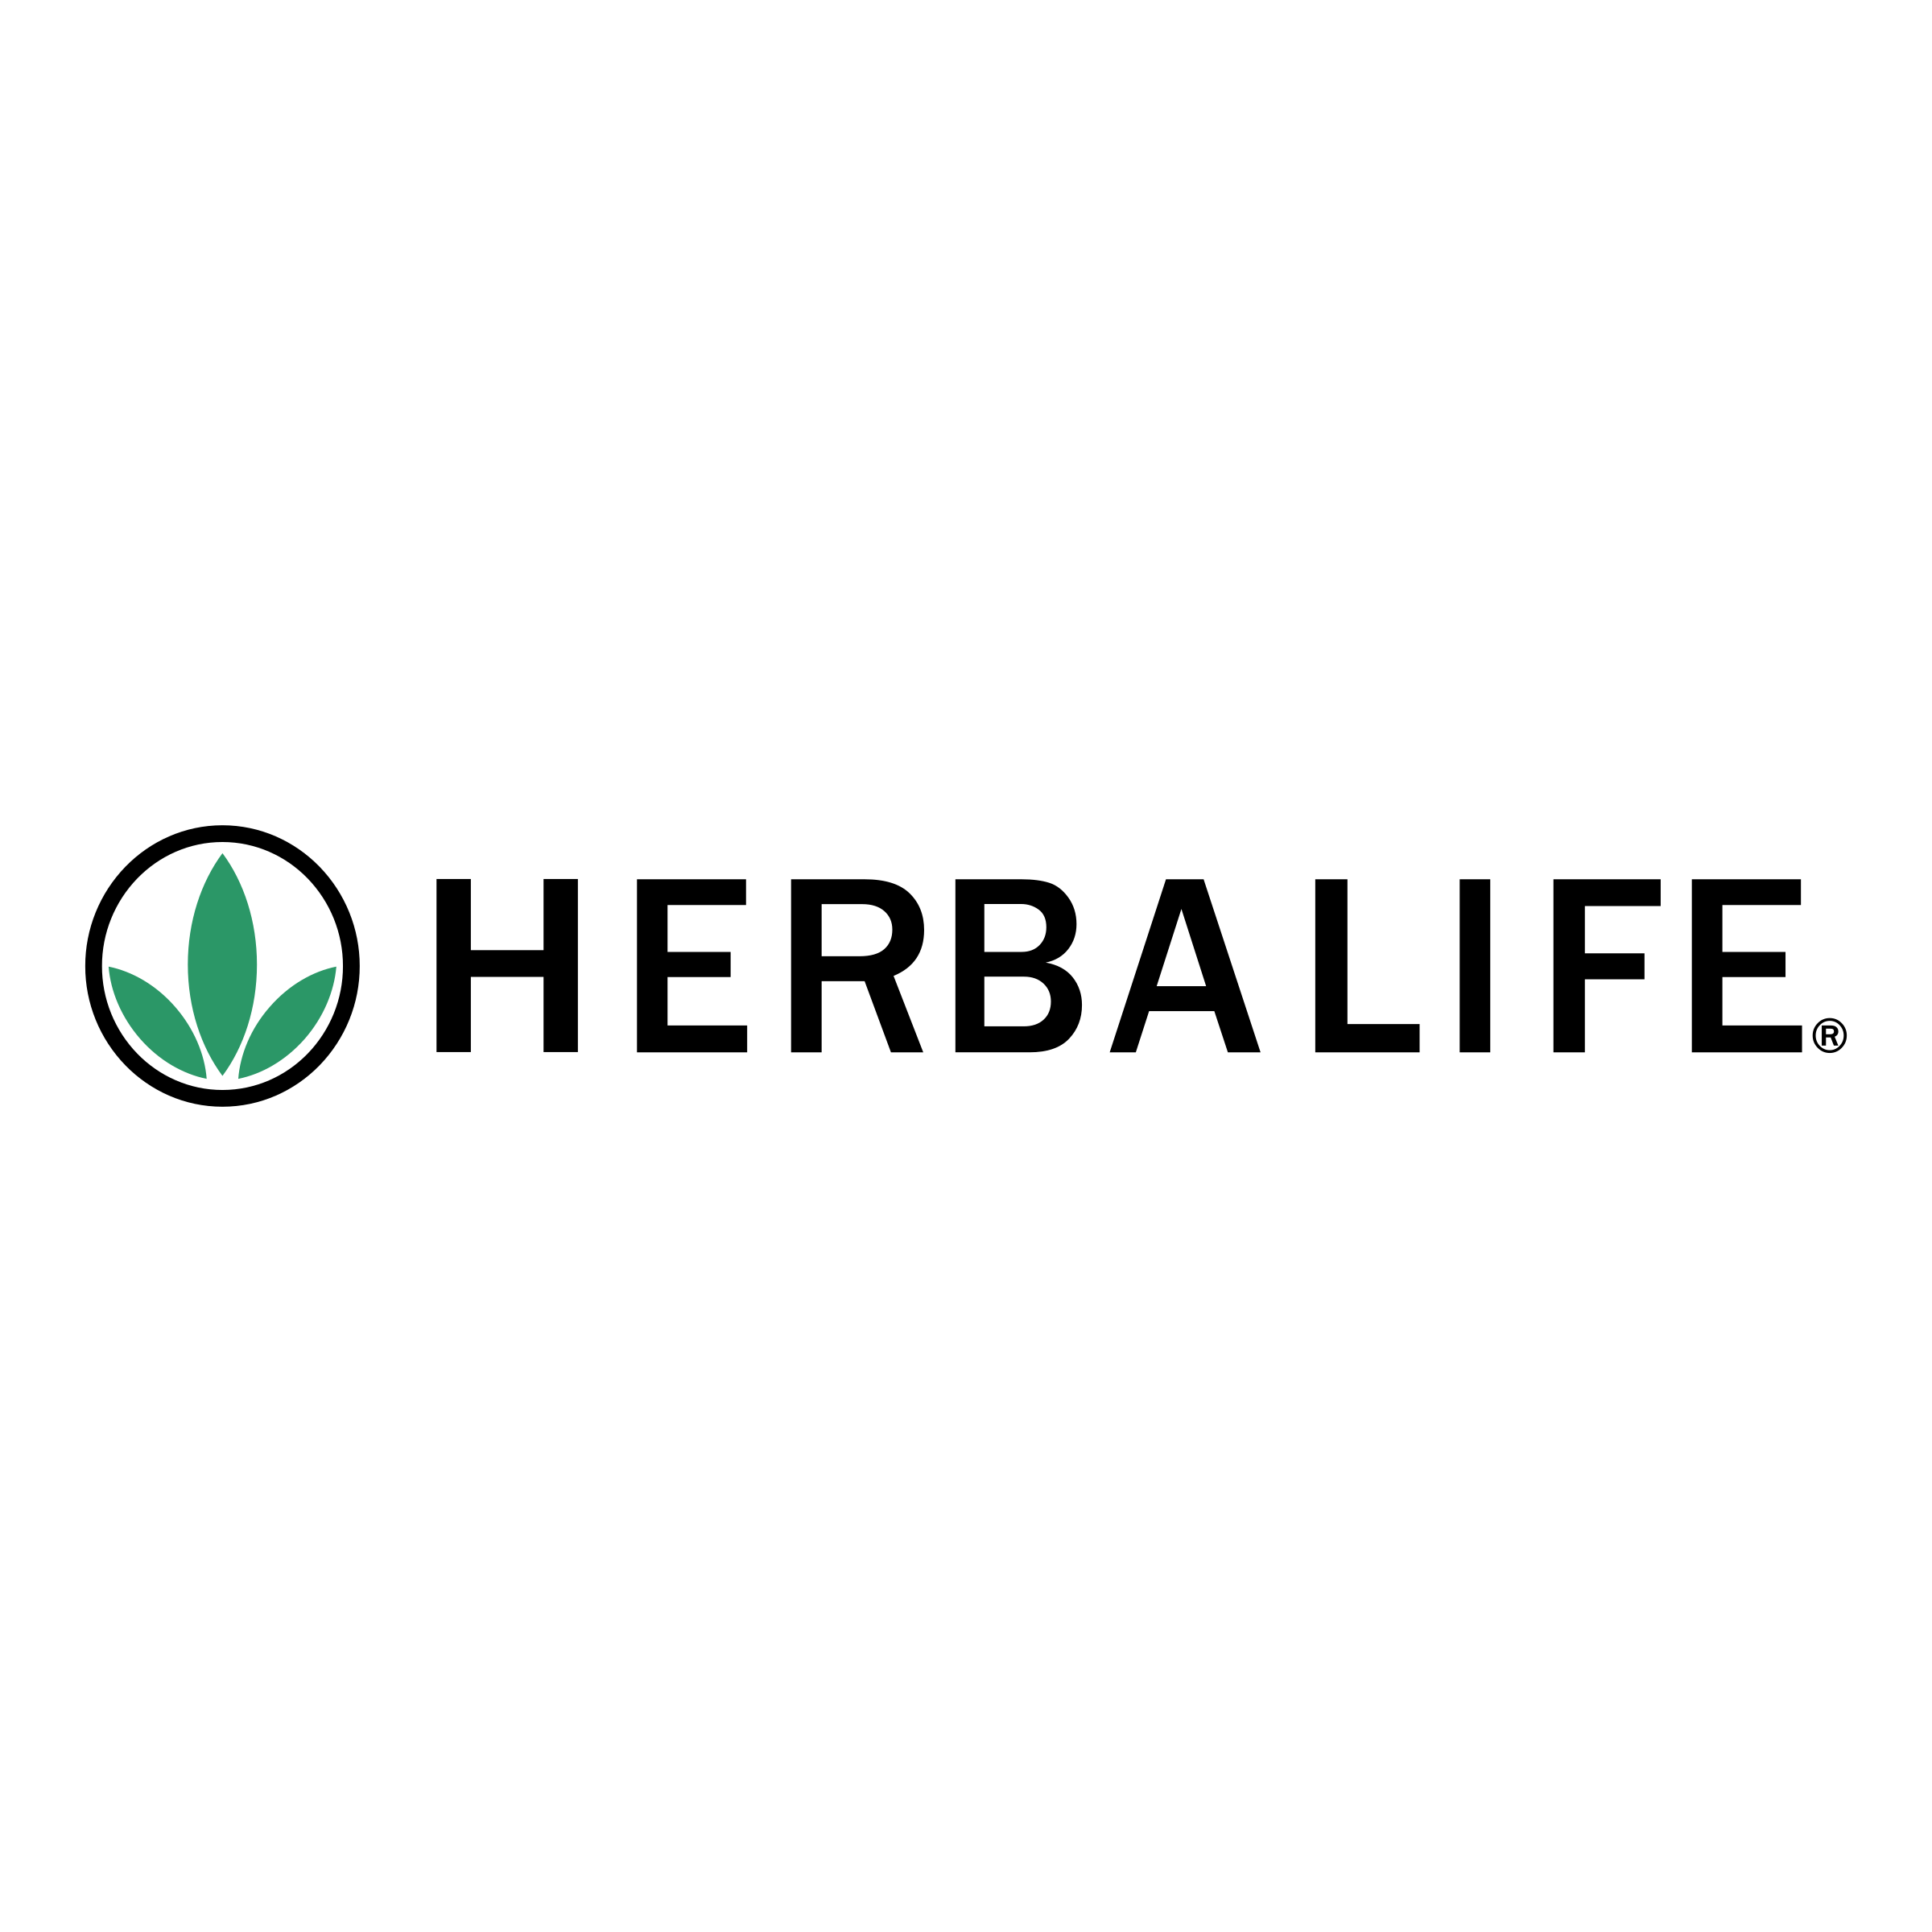 Herbalife Logo PNG Transparent & SVG Vector - Freebie Supply - Herbalife Logo White